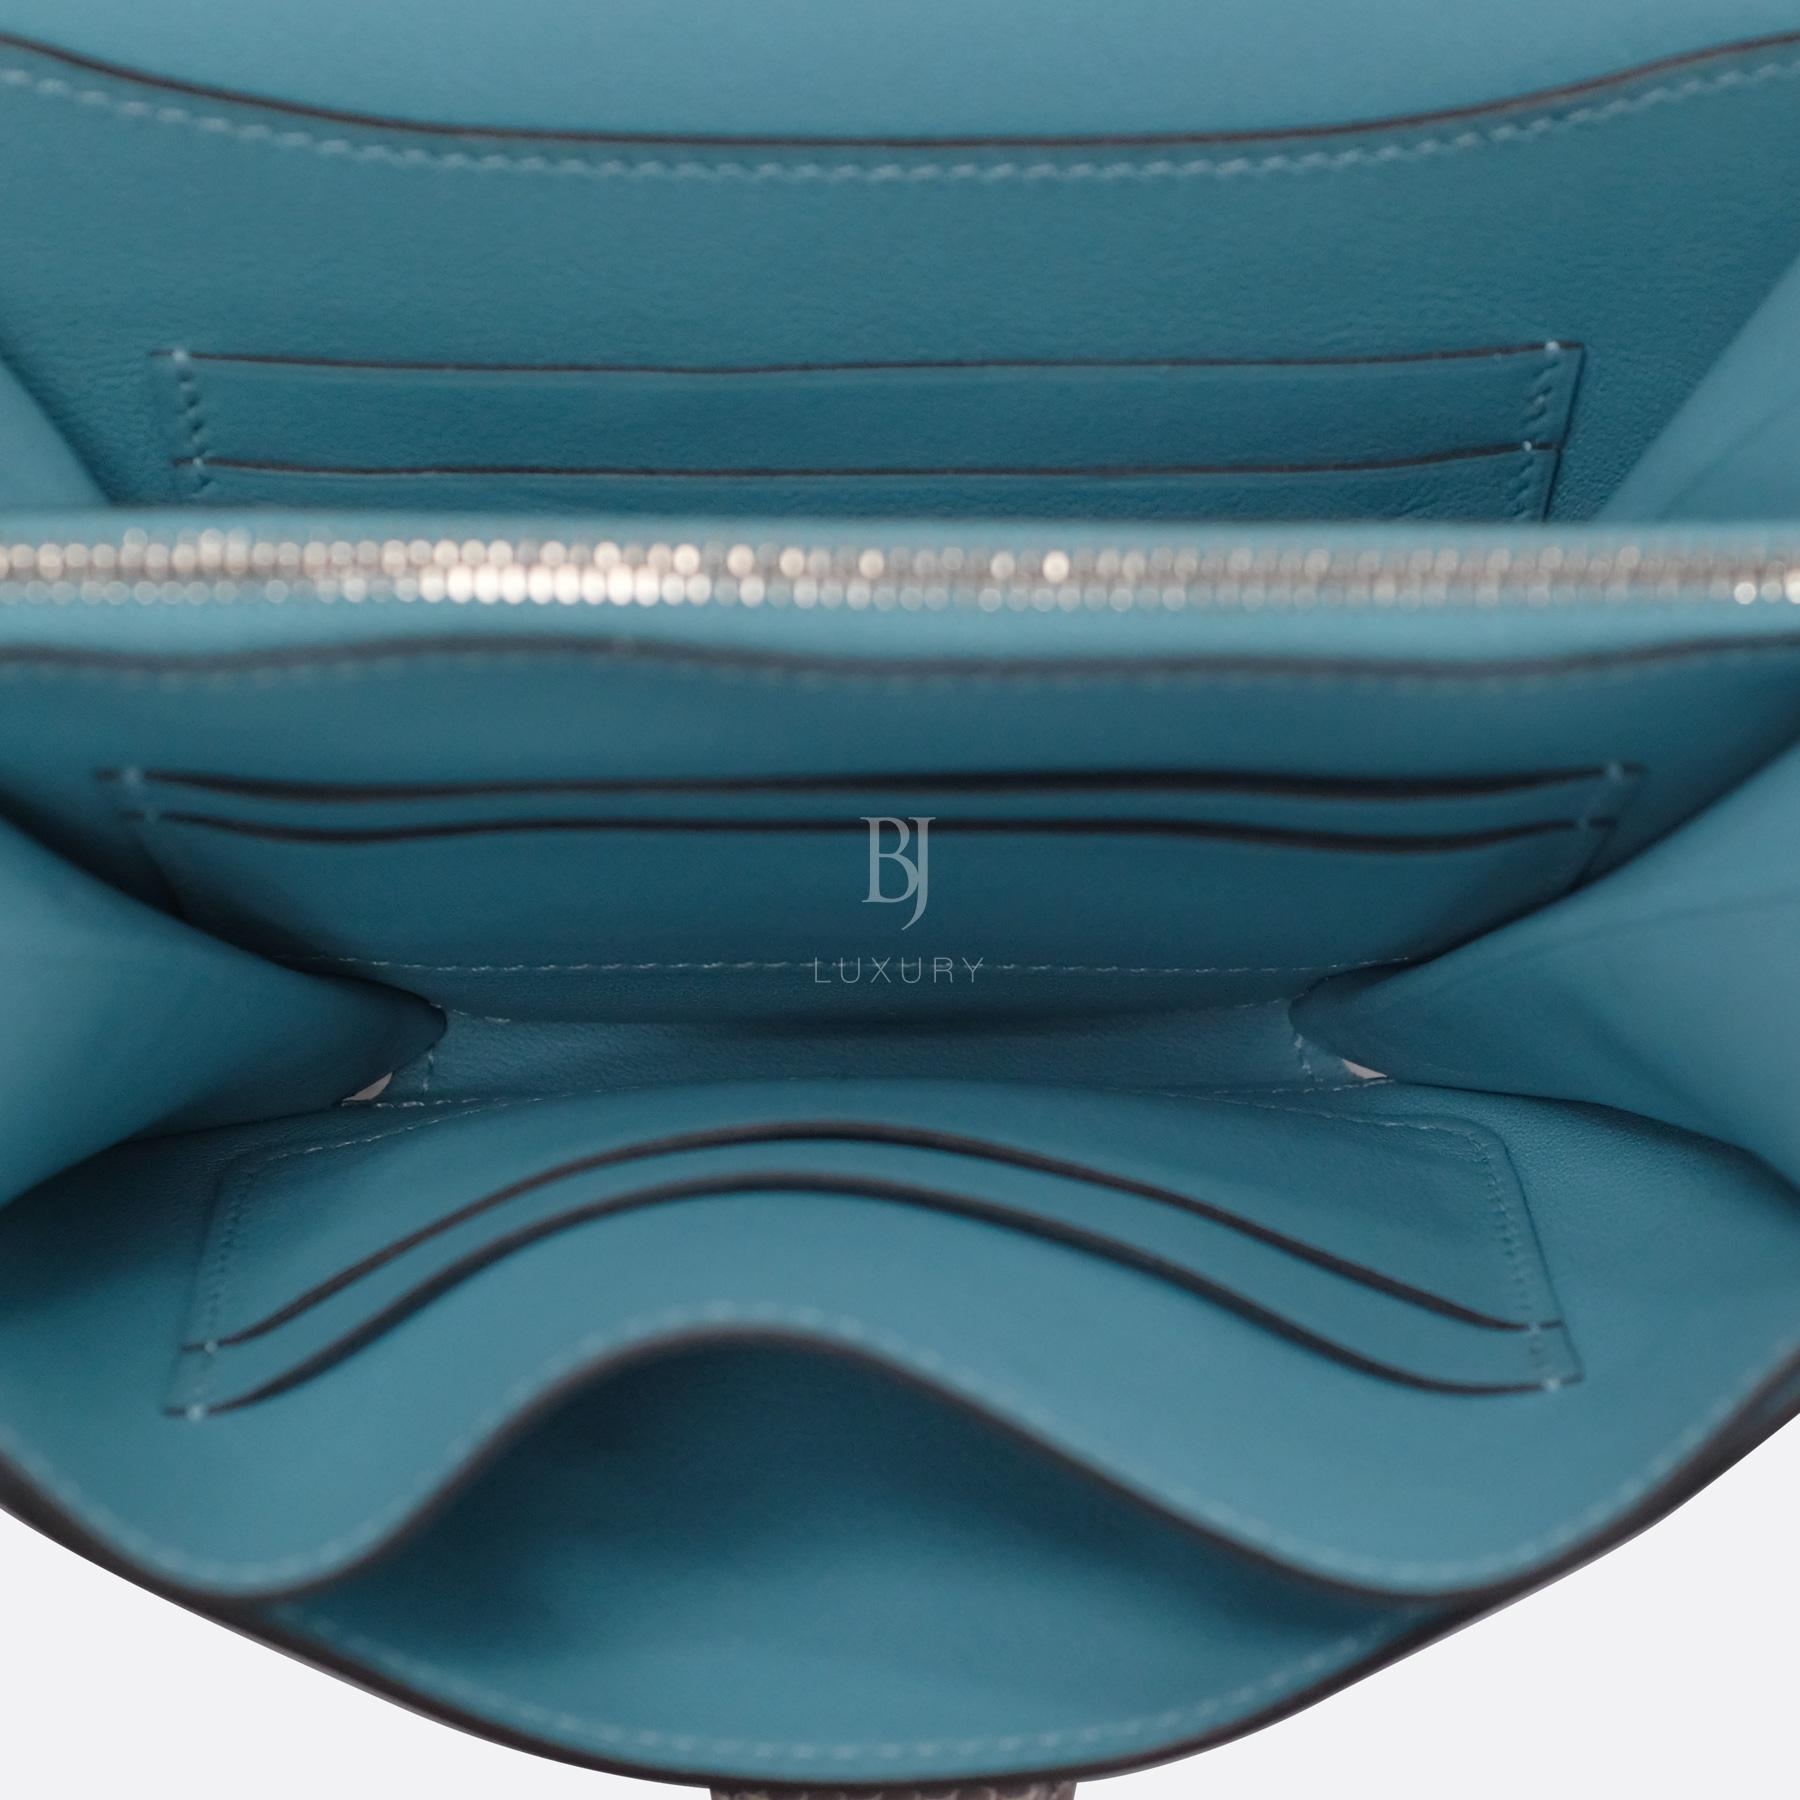 Hermes Conveyor Bag 16 Turquoise Swift Lizard Palladium BJ Luxury 15.jpg